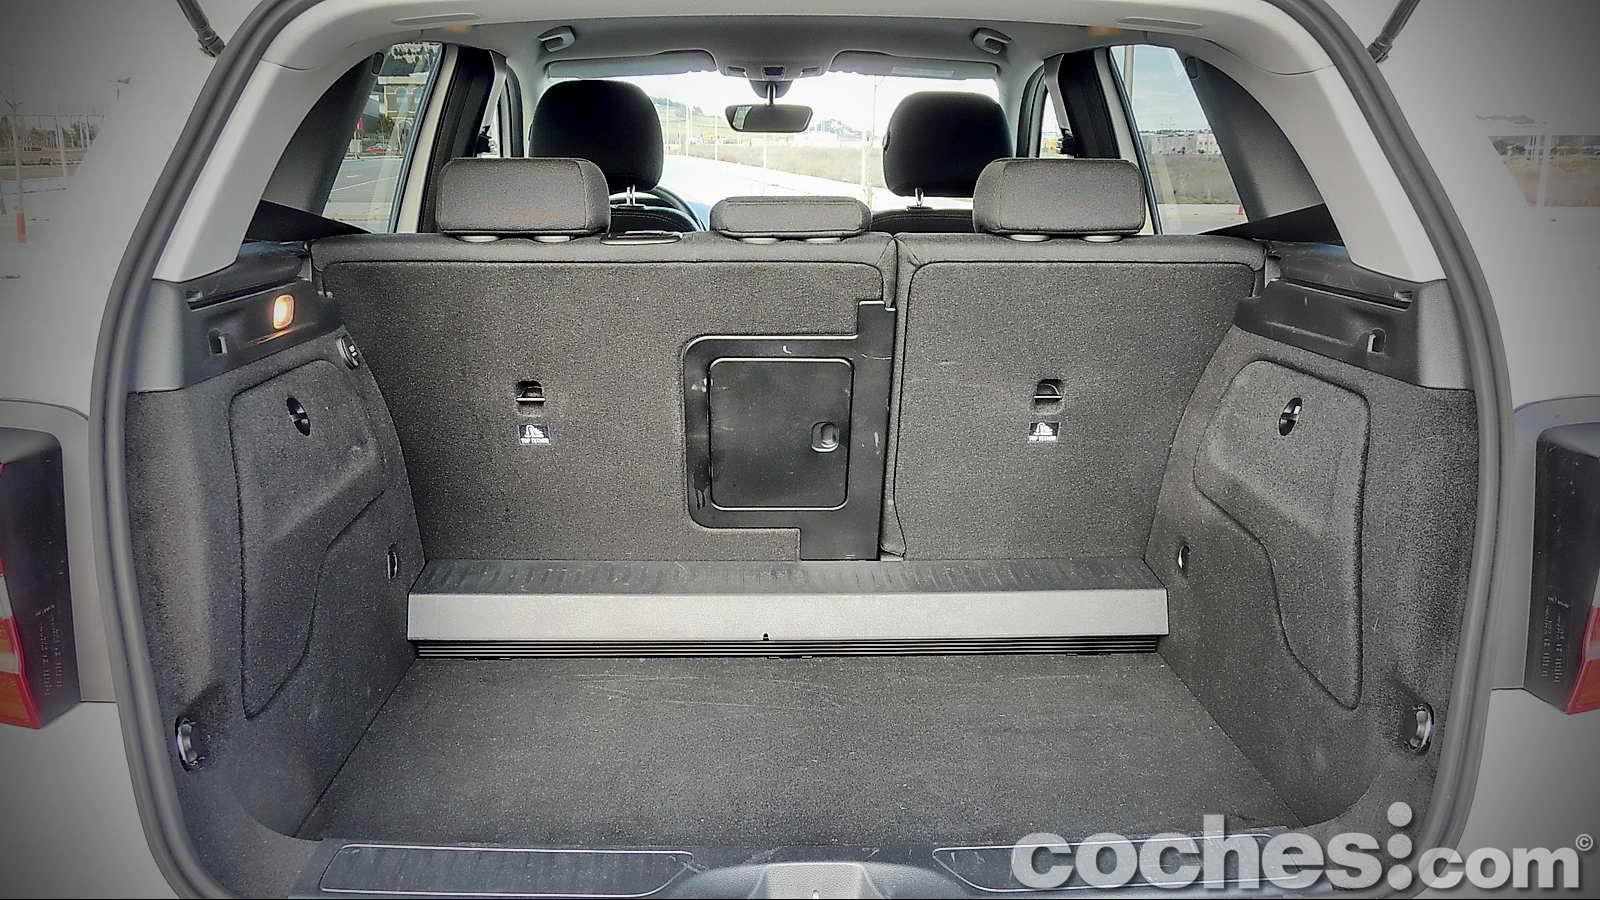 mercedes gla 180 cdi 7g dct mercedes gla best car review. Black Bedroom Furniture Sets. Home Design Ideas